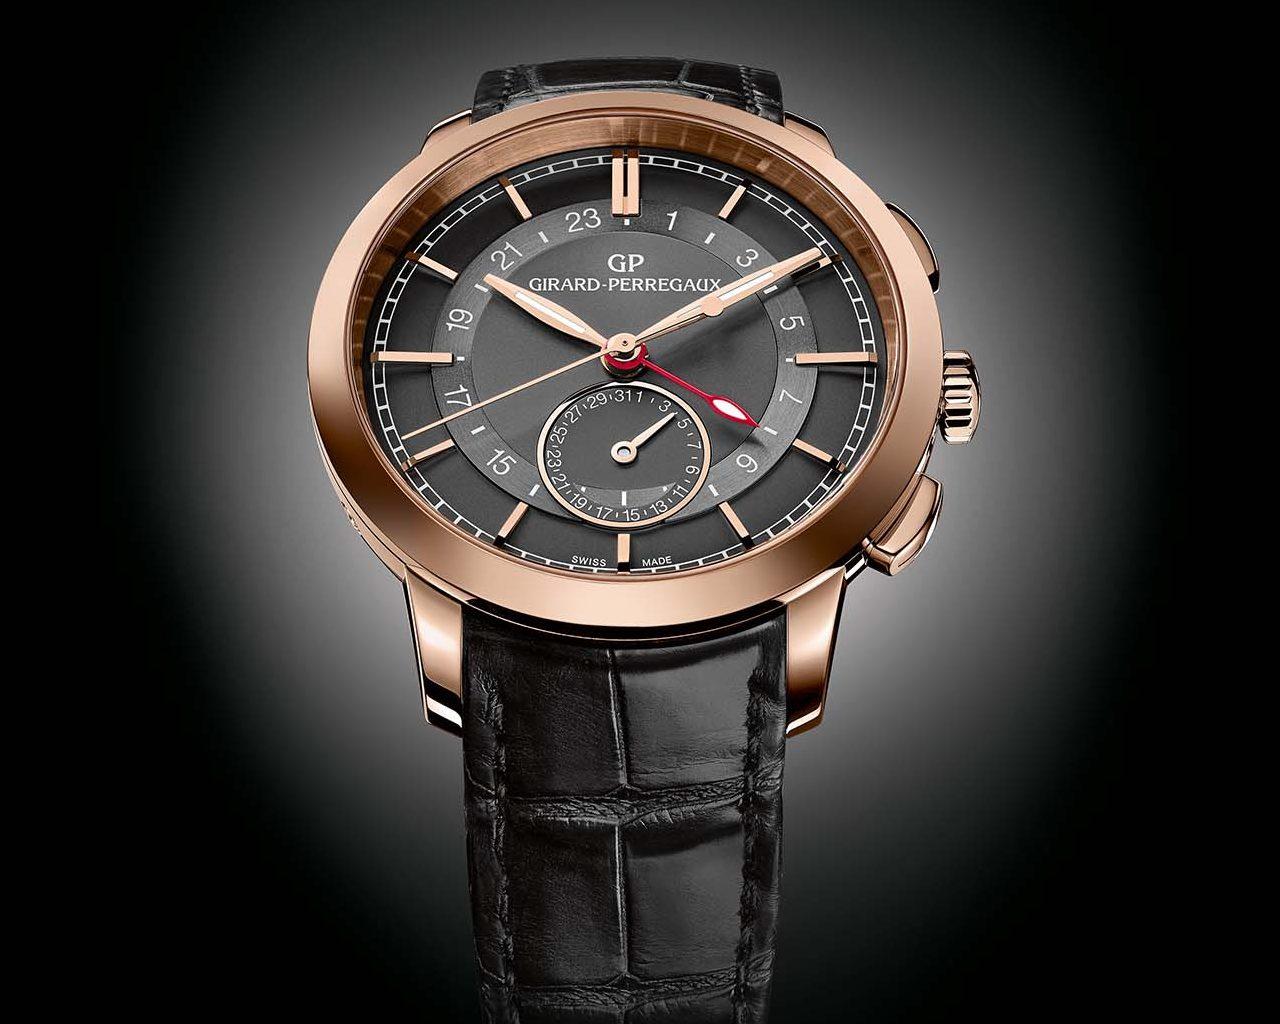 girard-perregaux-1966-dual-time-ref-49544-52-131-bbb0-ref-49544-52-231-bb60-prezzo-price-0-100_1